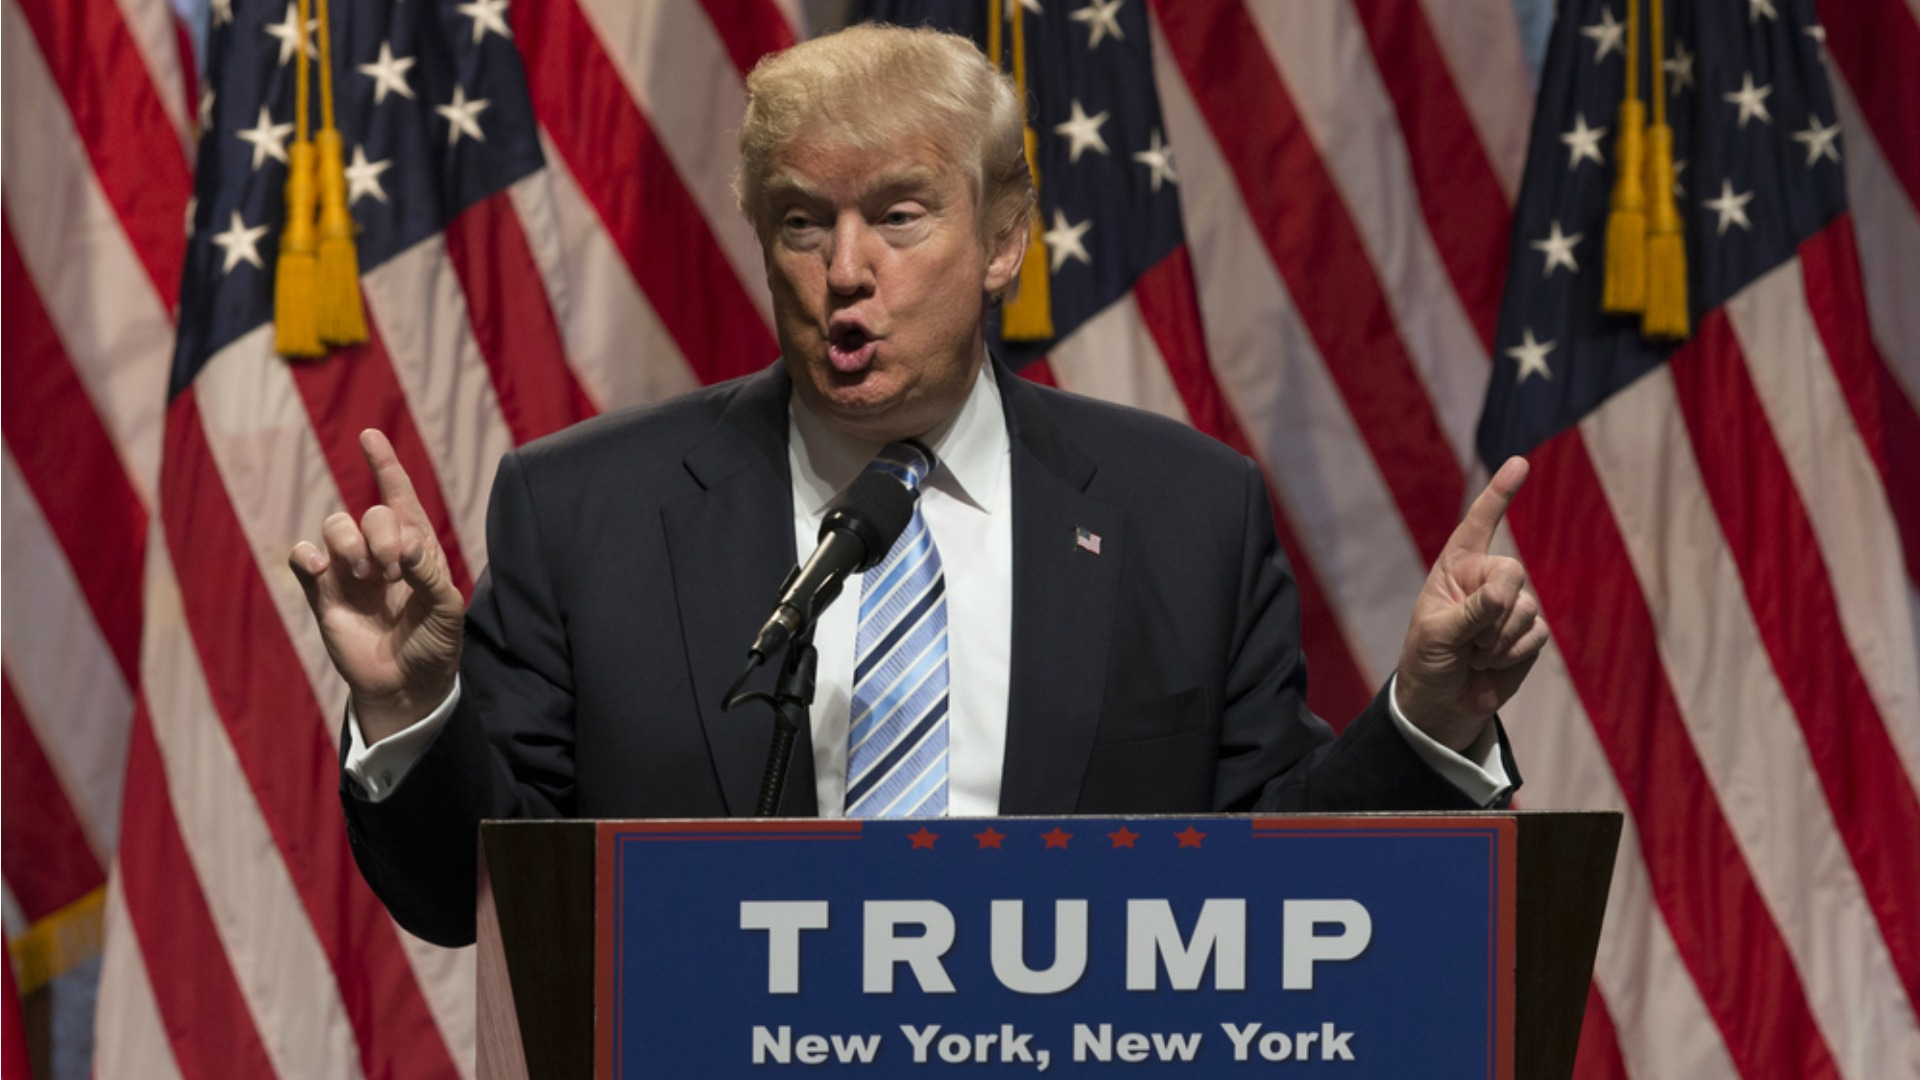 A: Real Trump!